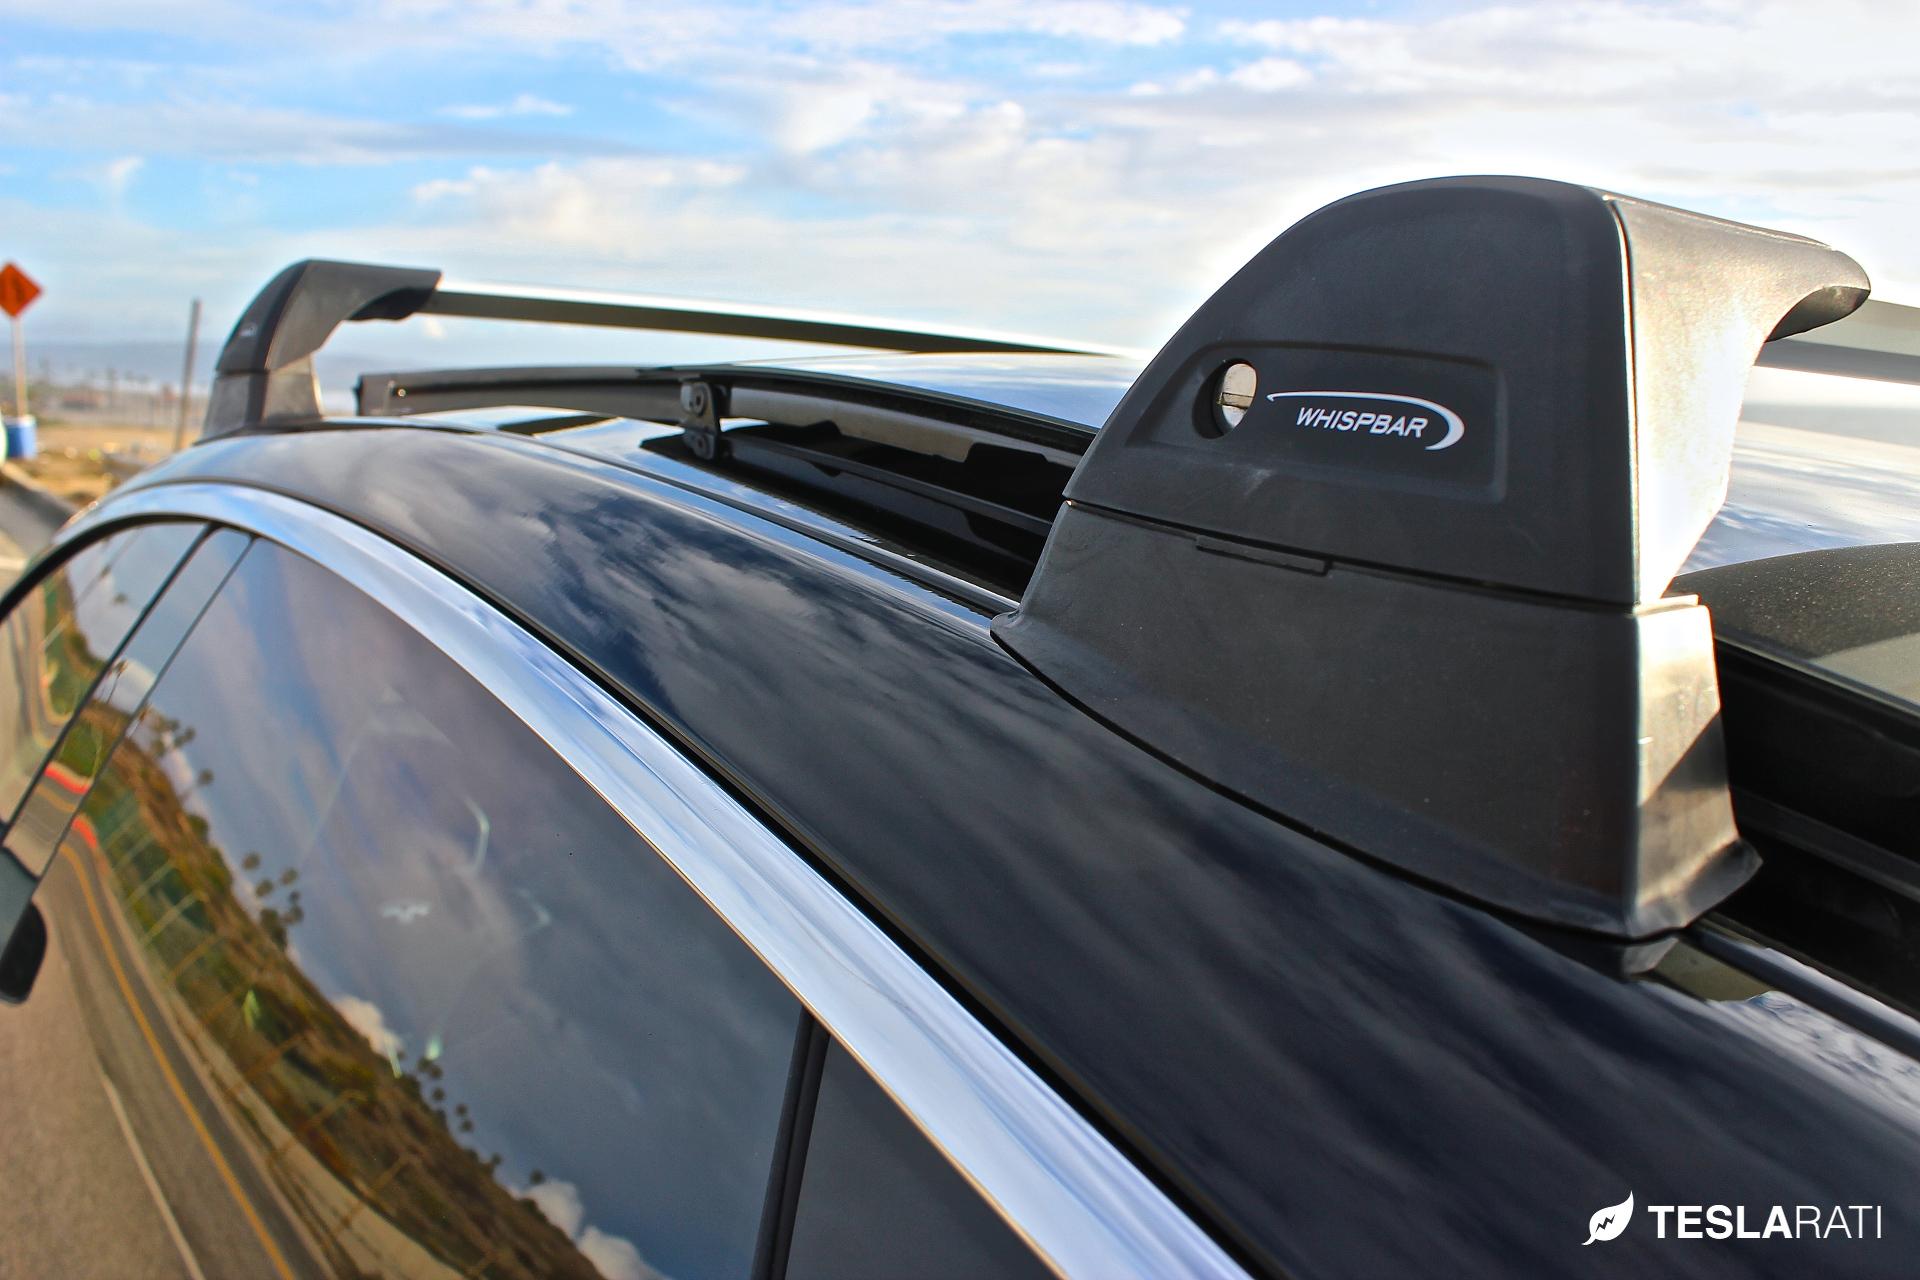 Tesla-Model-S-Whispbar-Roof-Rack-Pano-Clearance